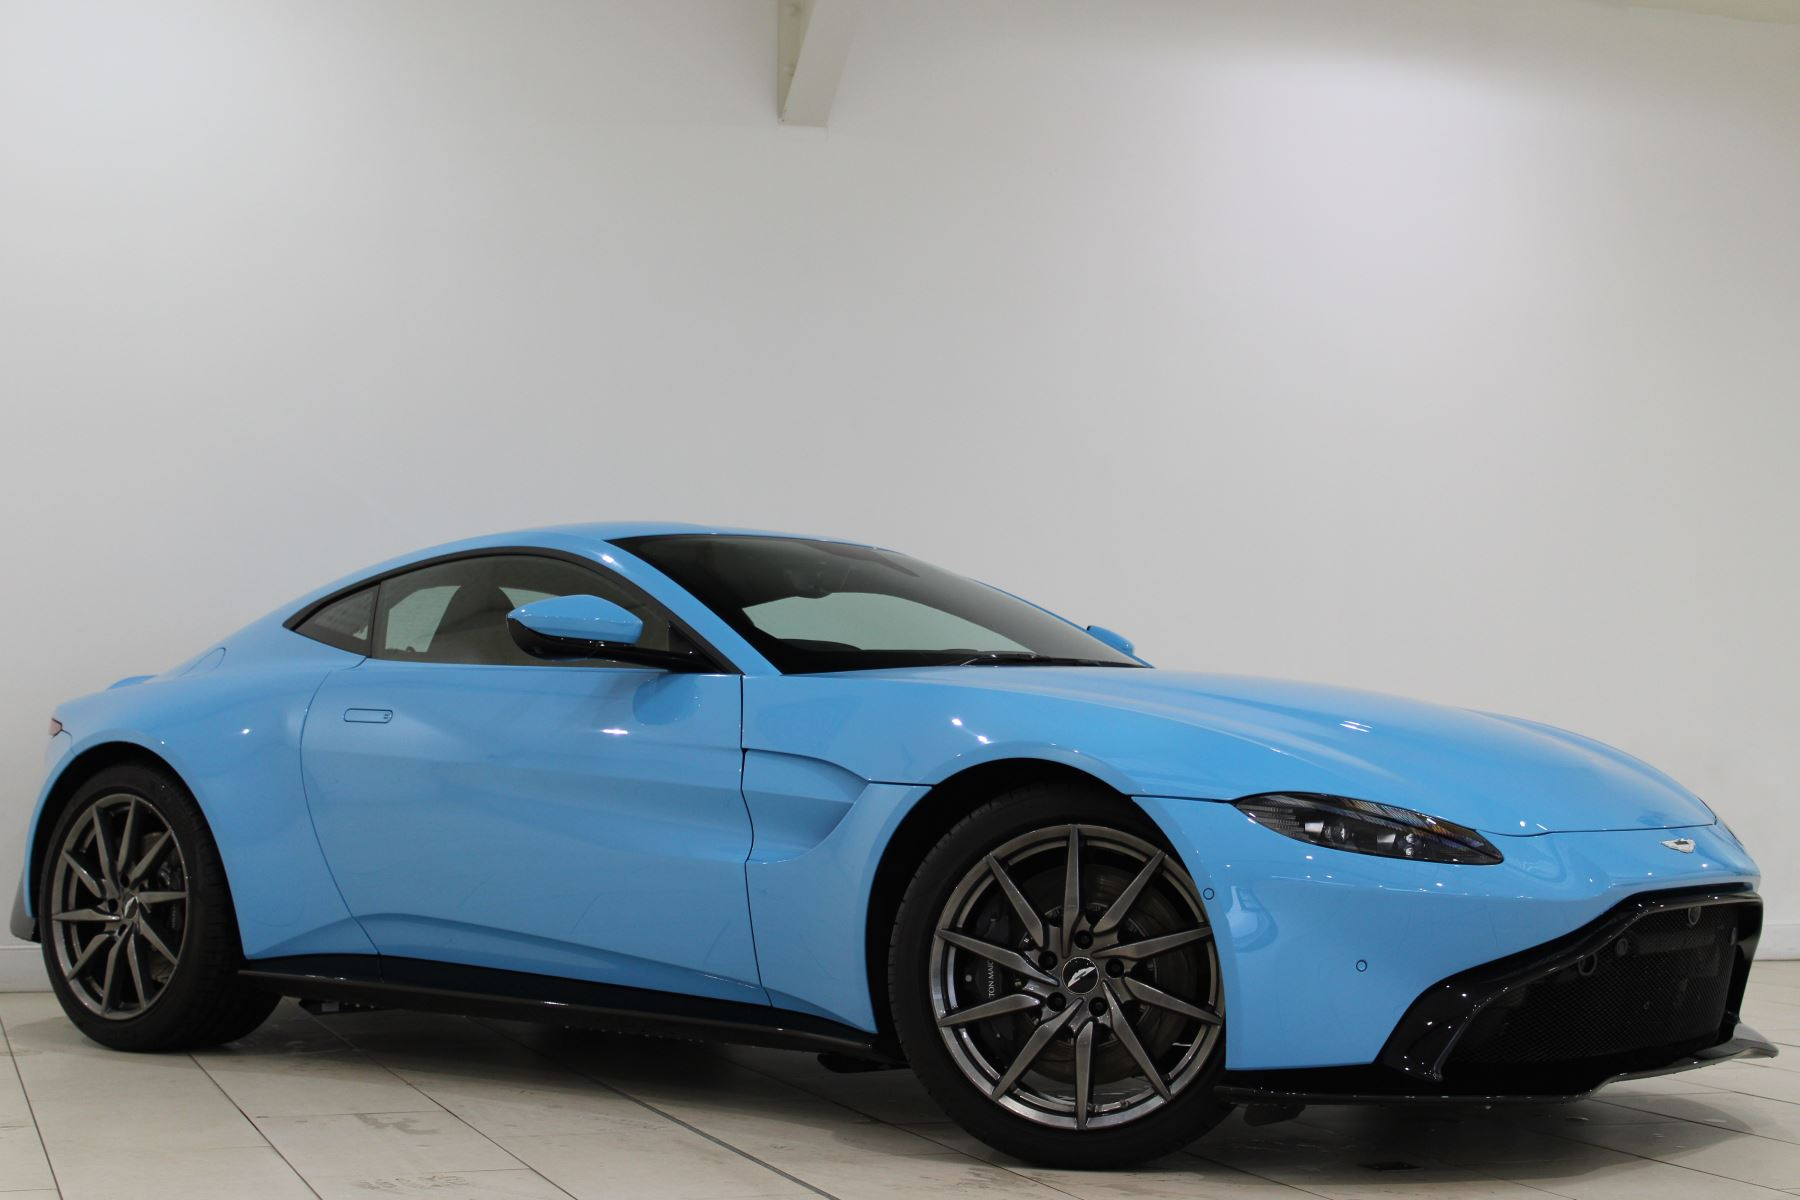 Aston Martin New Vantage 2dr image 8